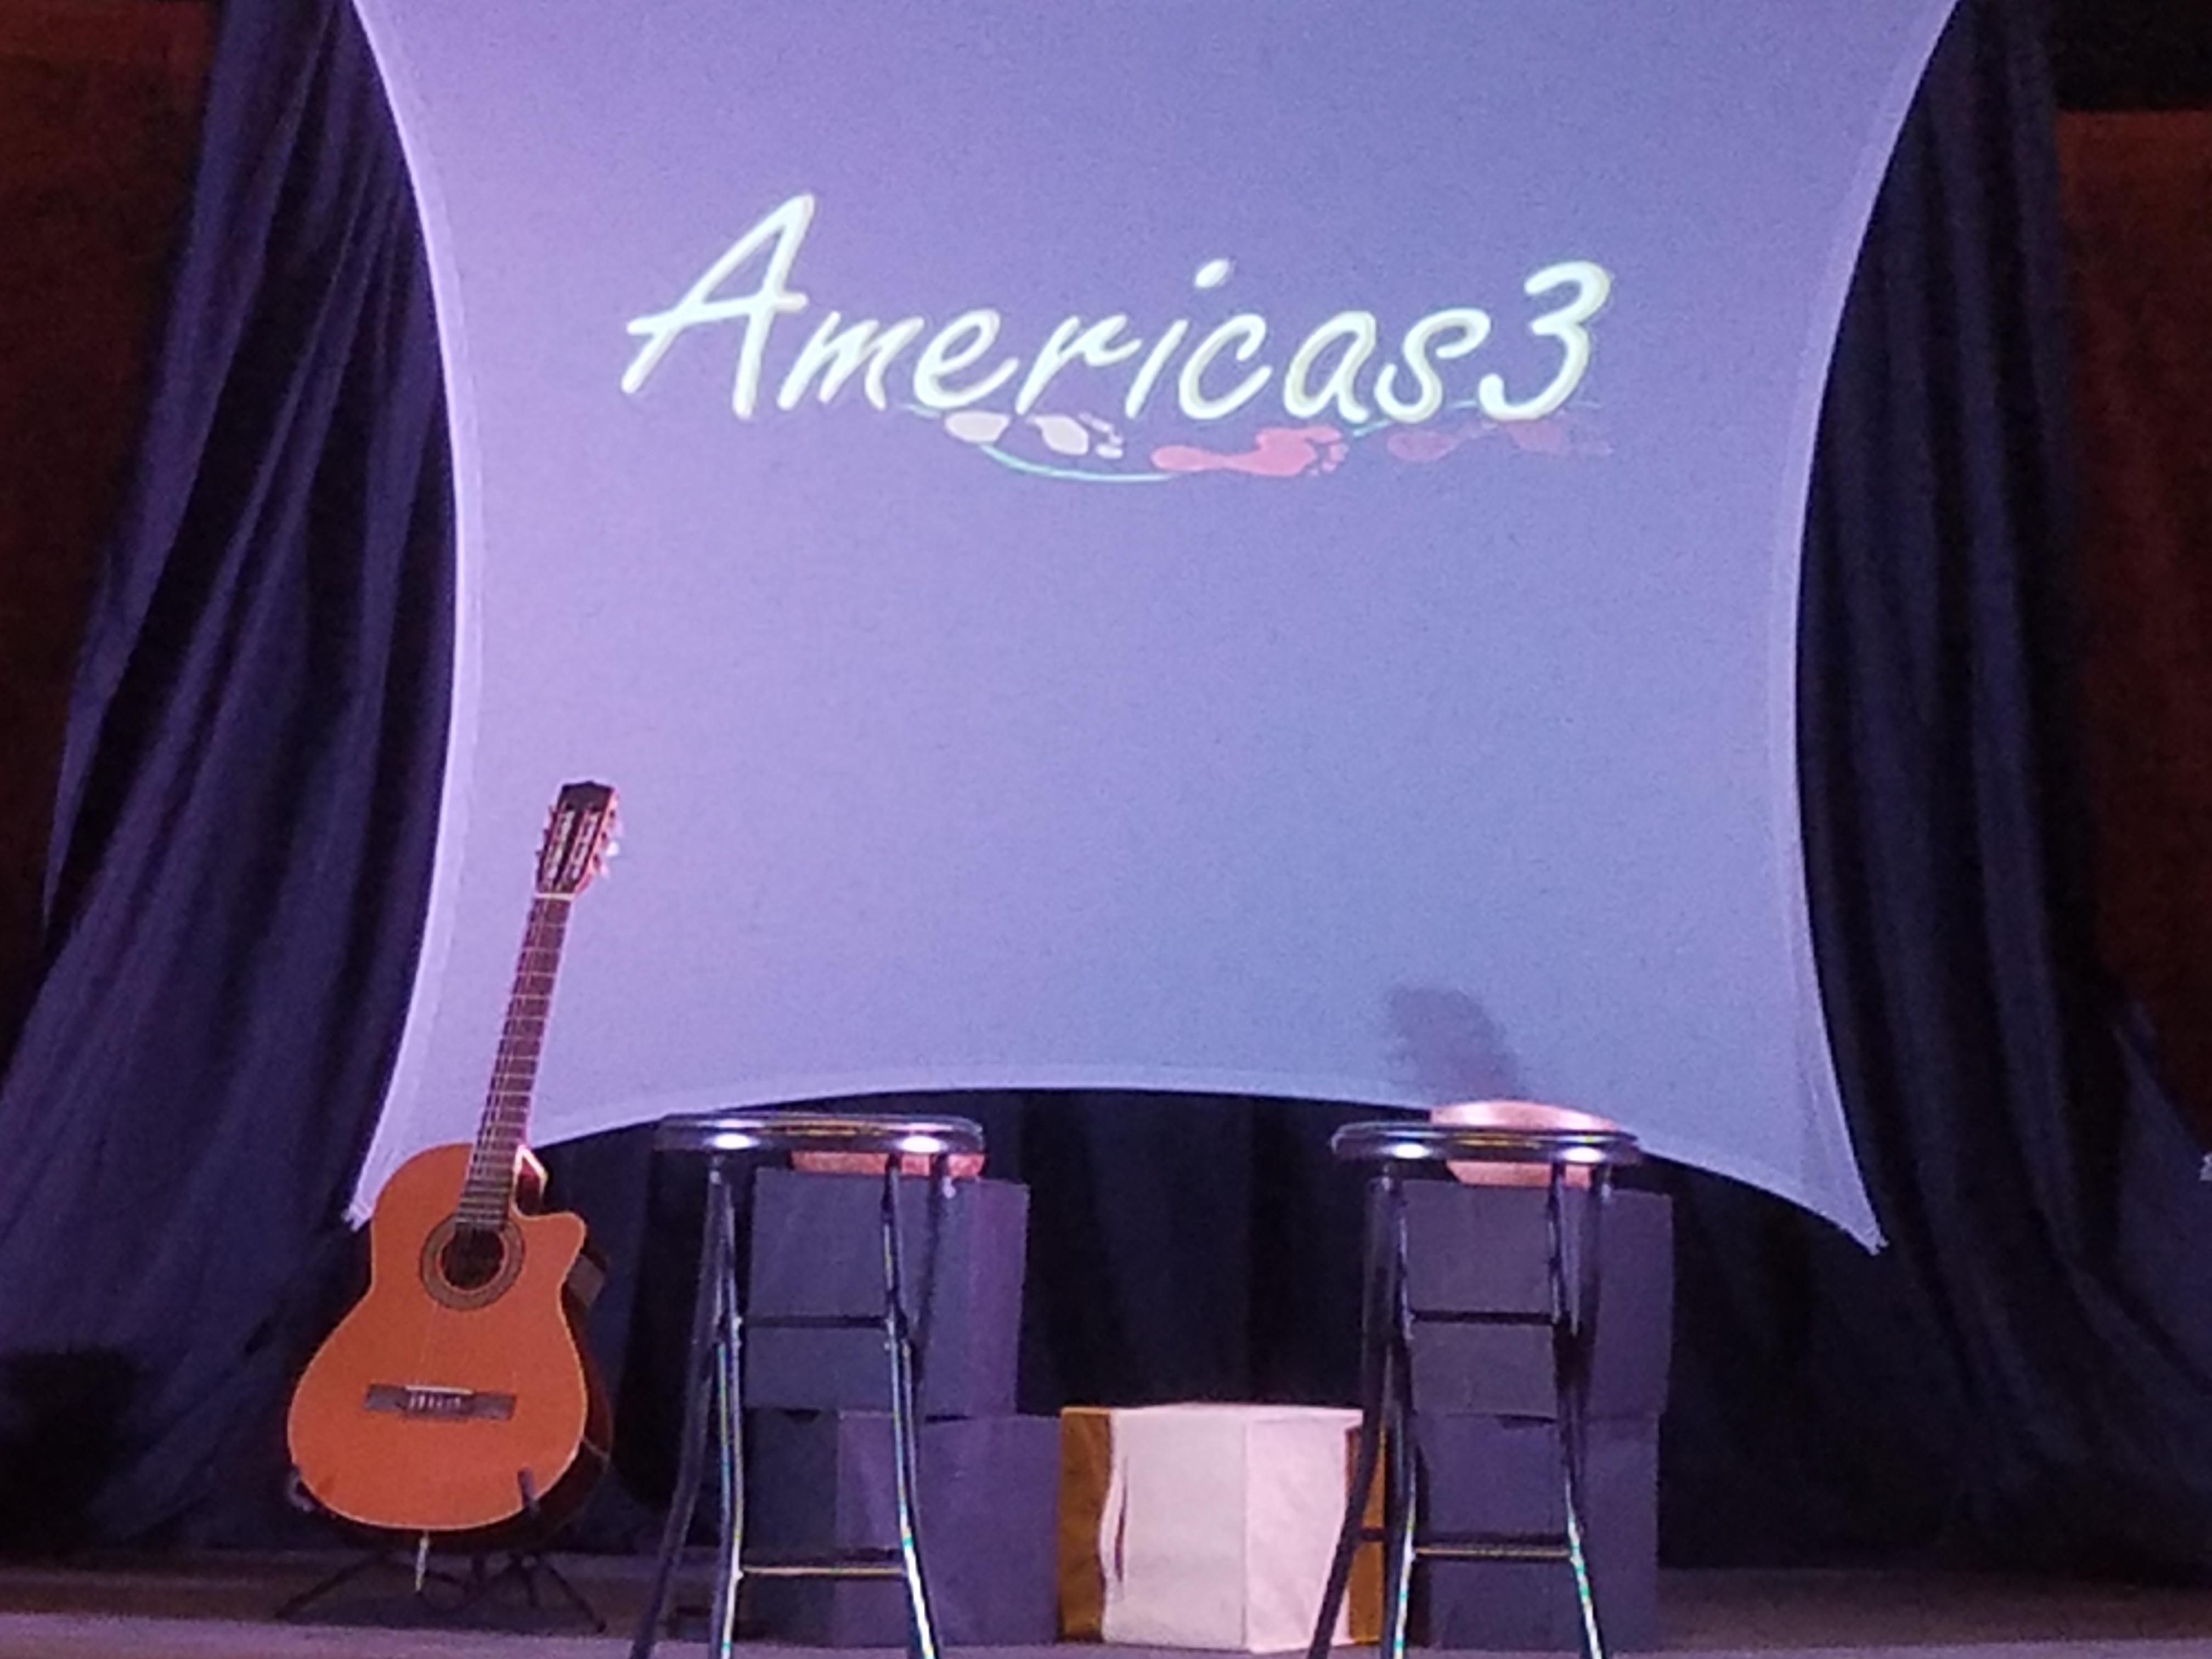 Americas3